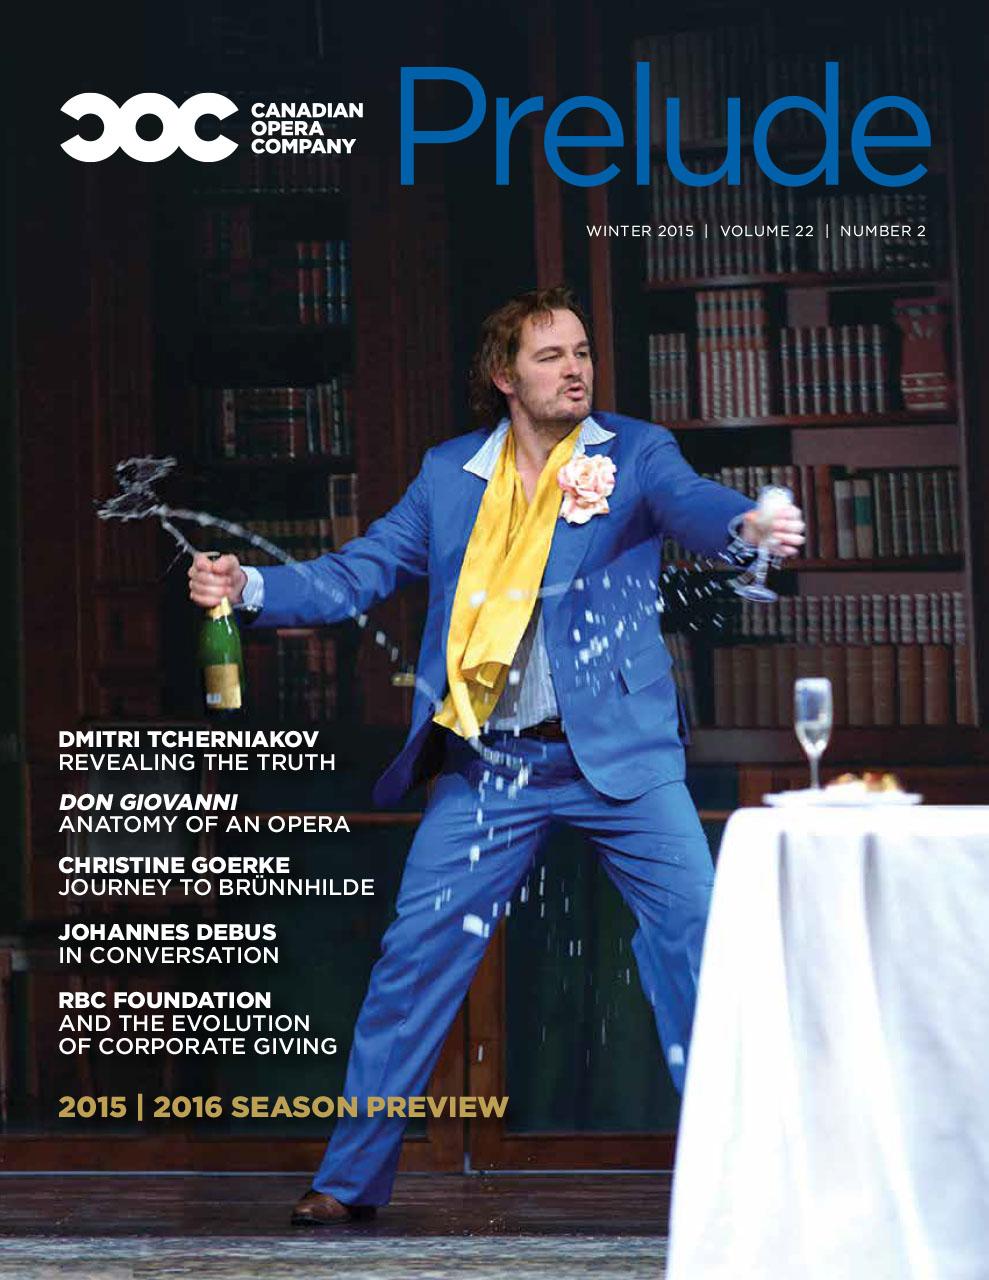 COC 'Prelude' members magazine